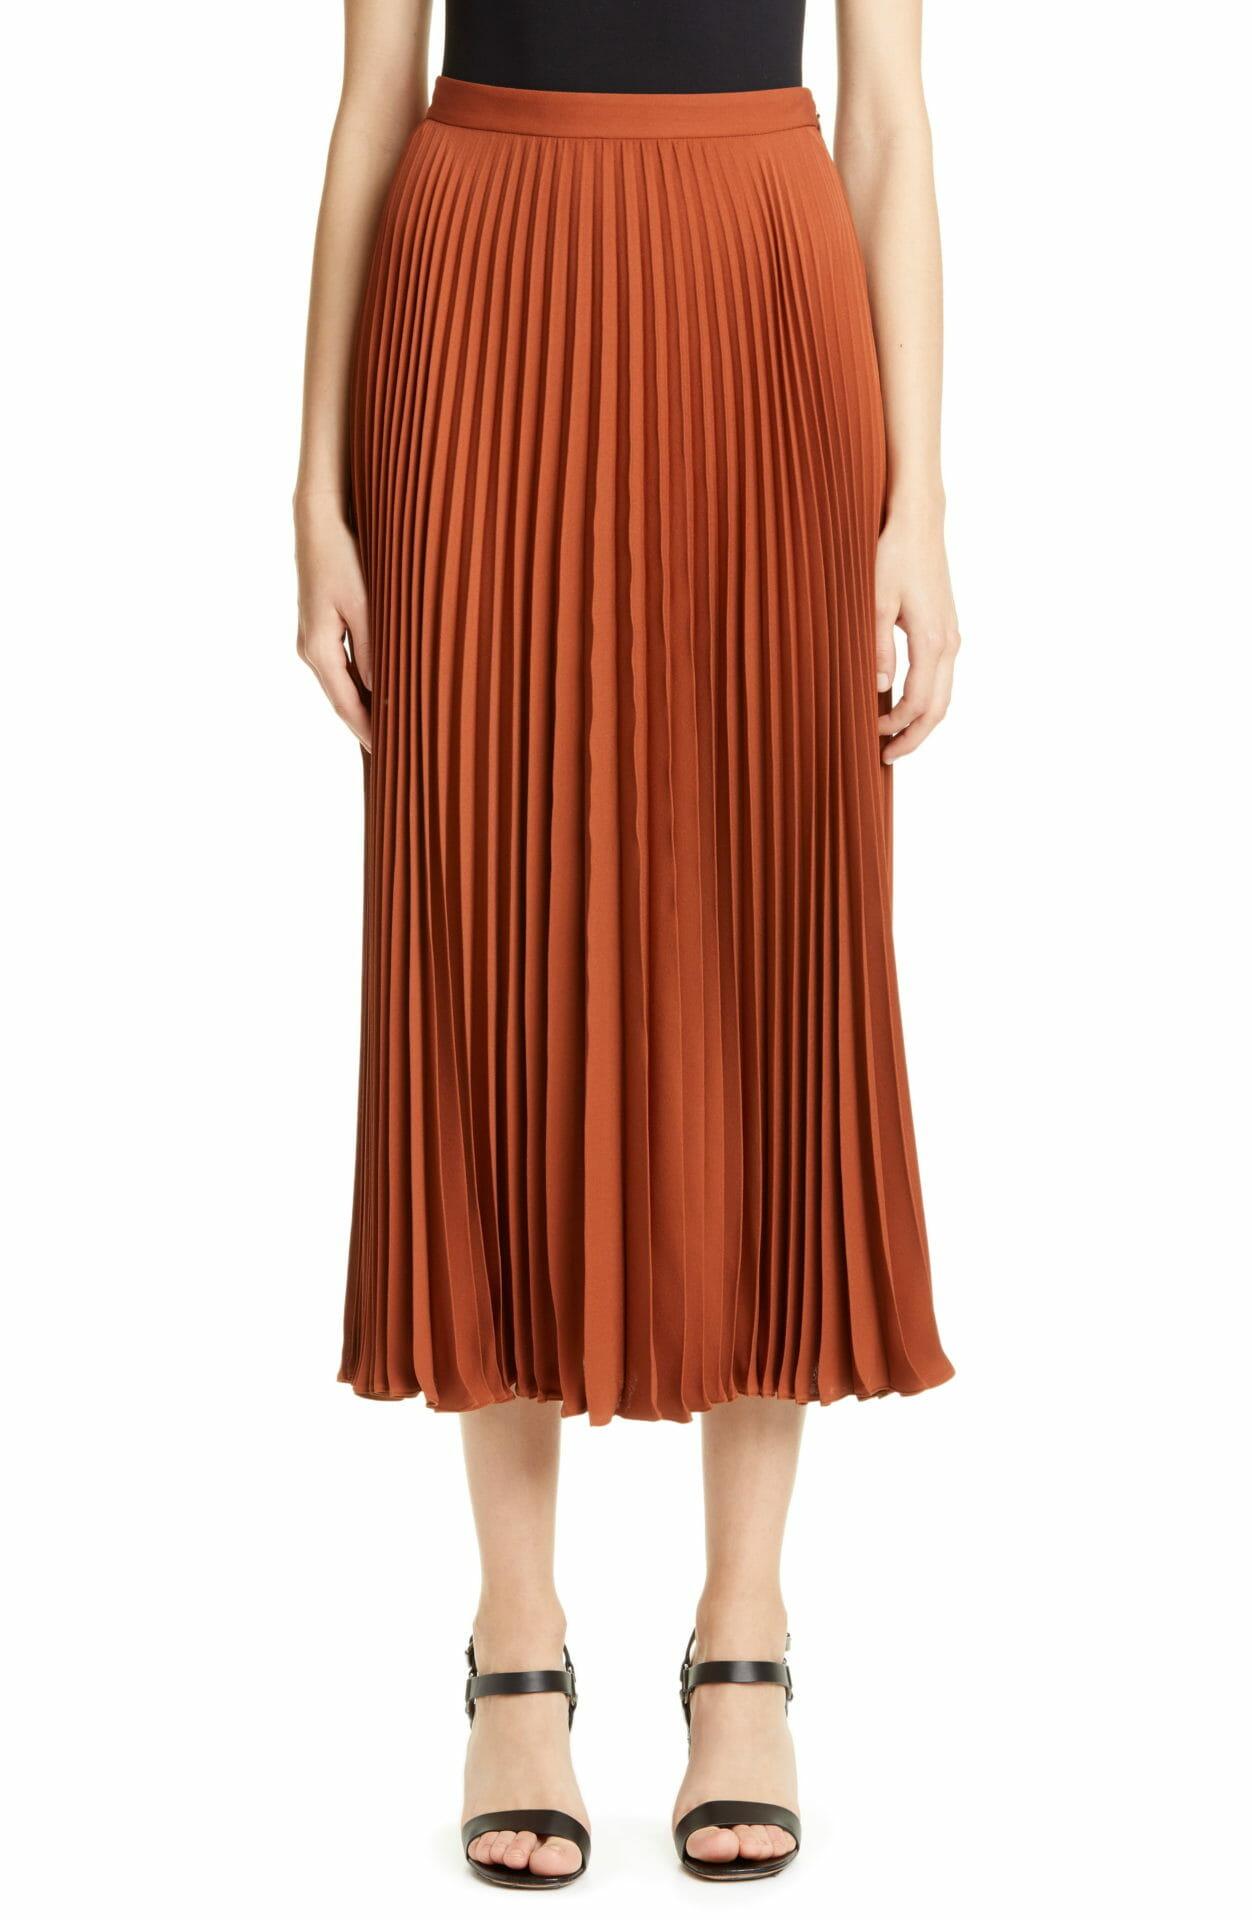 VALENTINO Plissé Silk Midi Skirt, Main, color, LAN-LAND